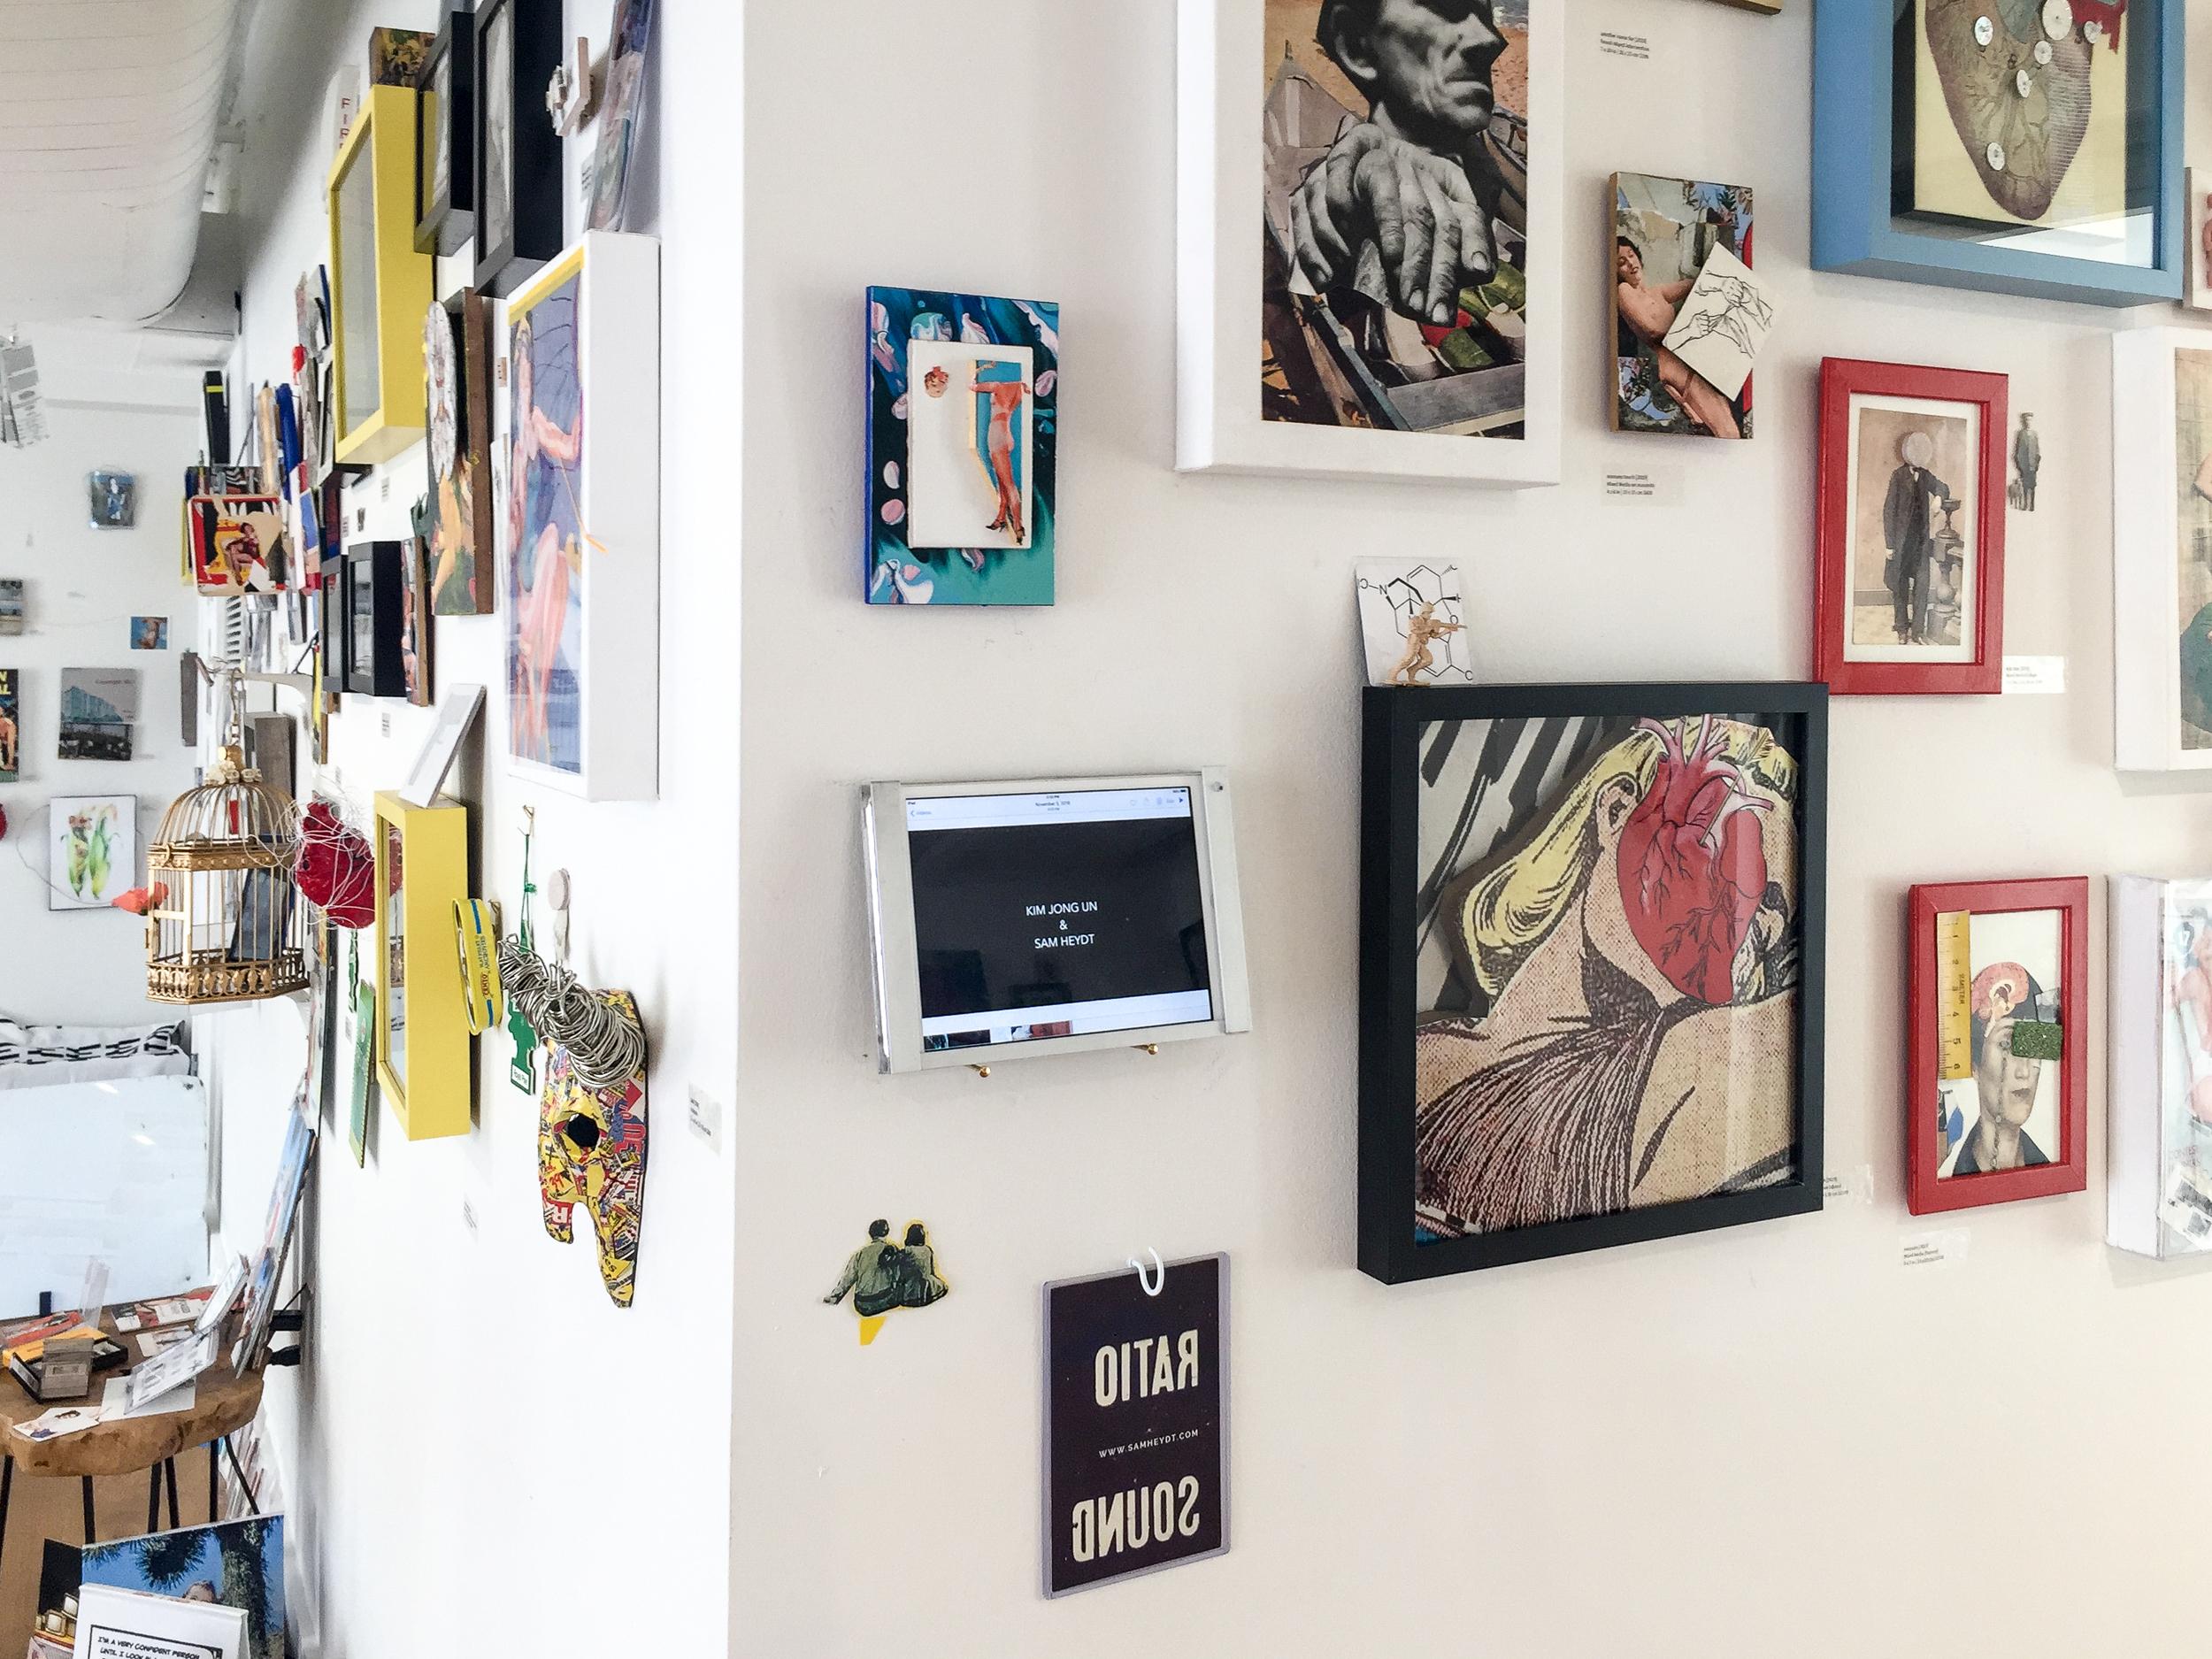 Faena-Exhibition-Images-94.jpg